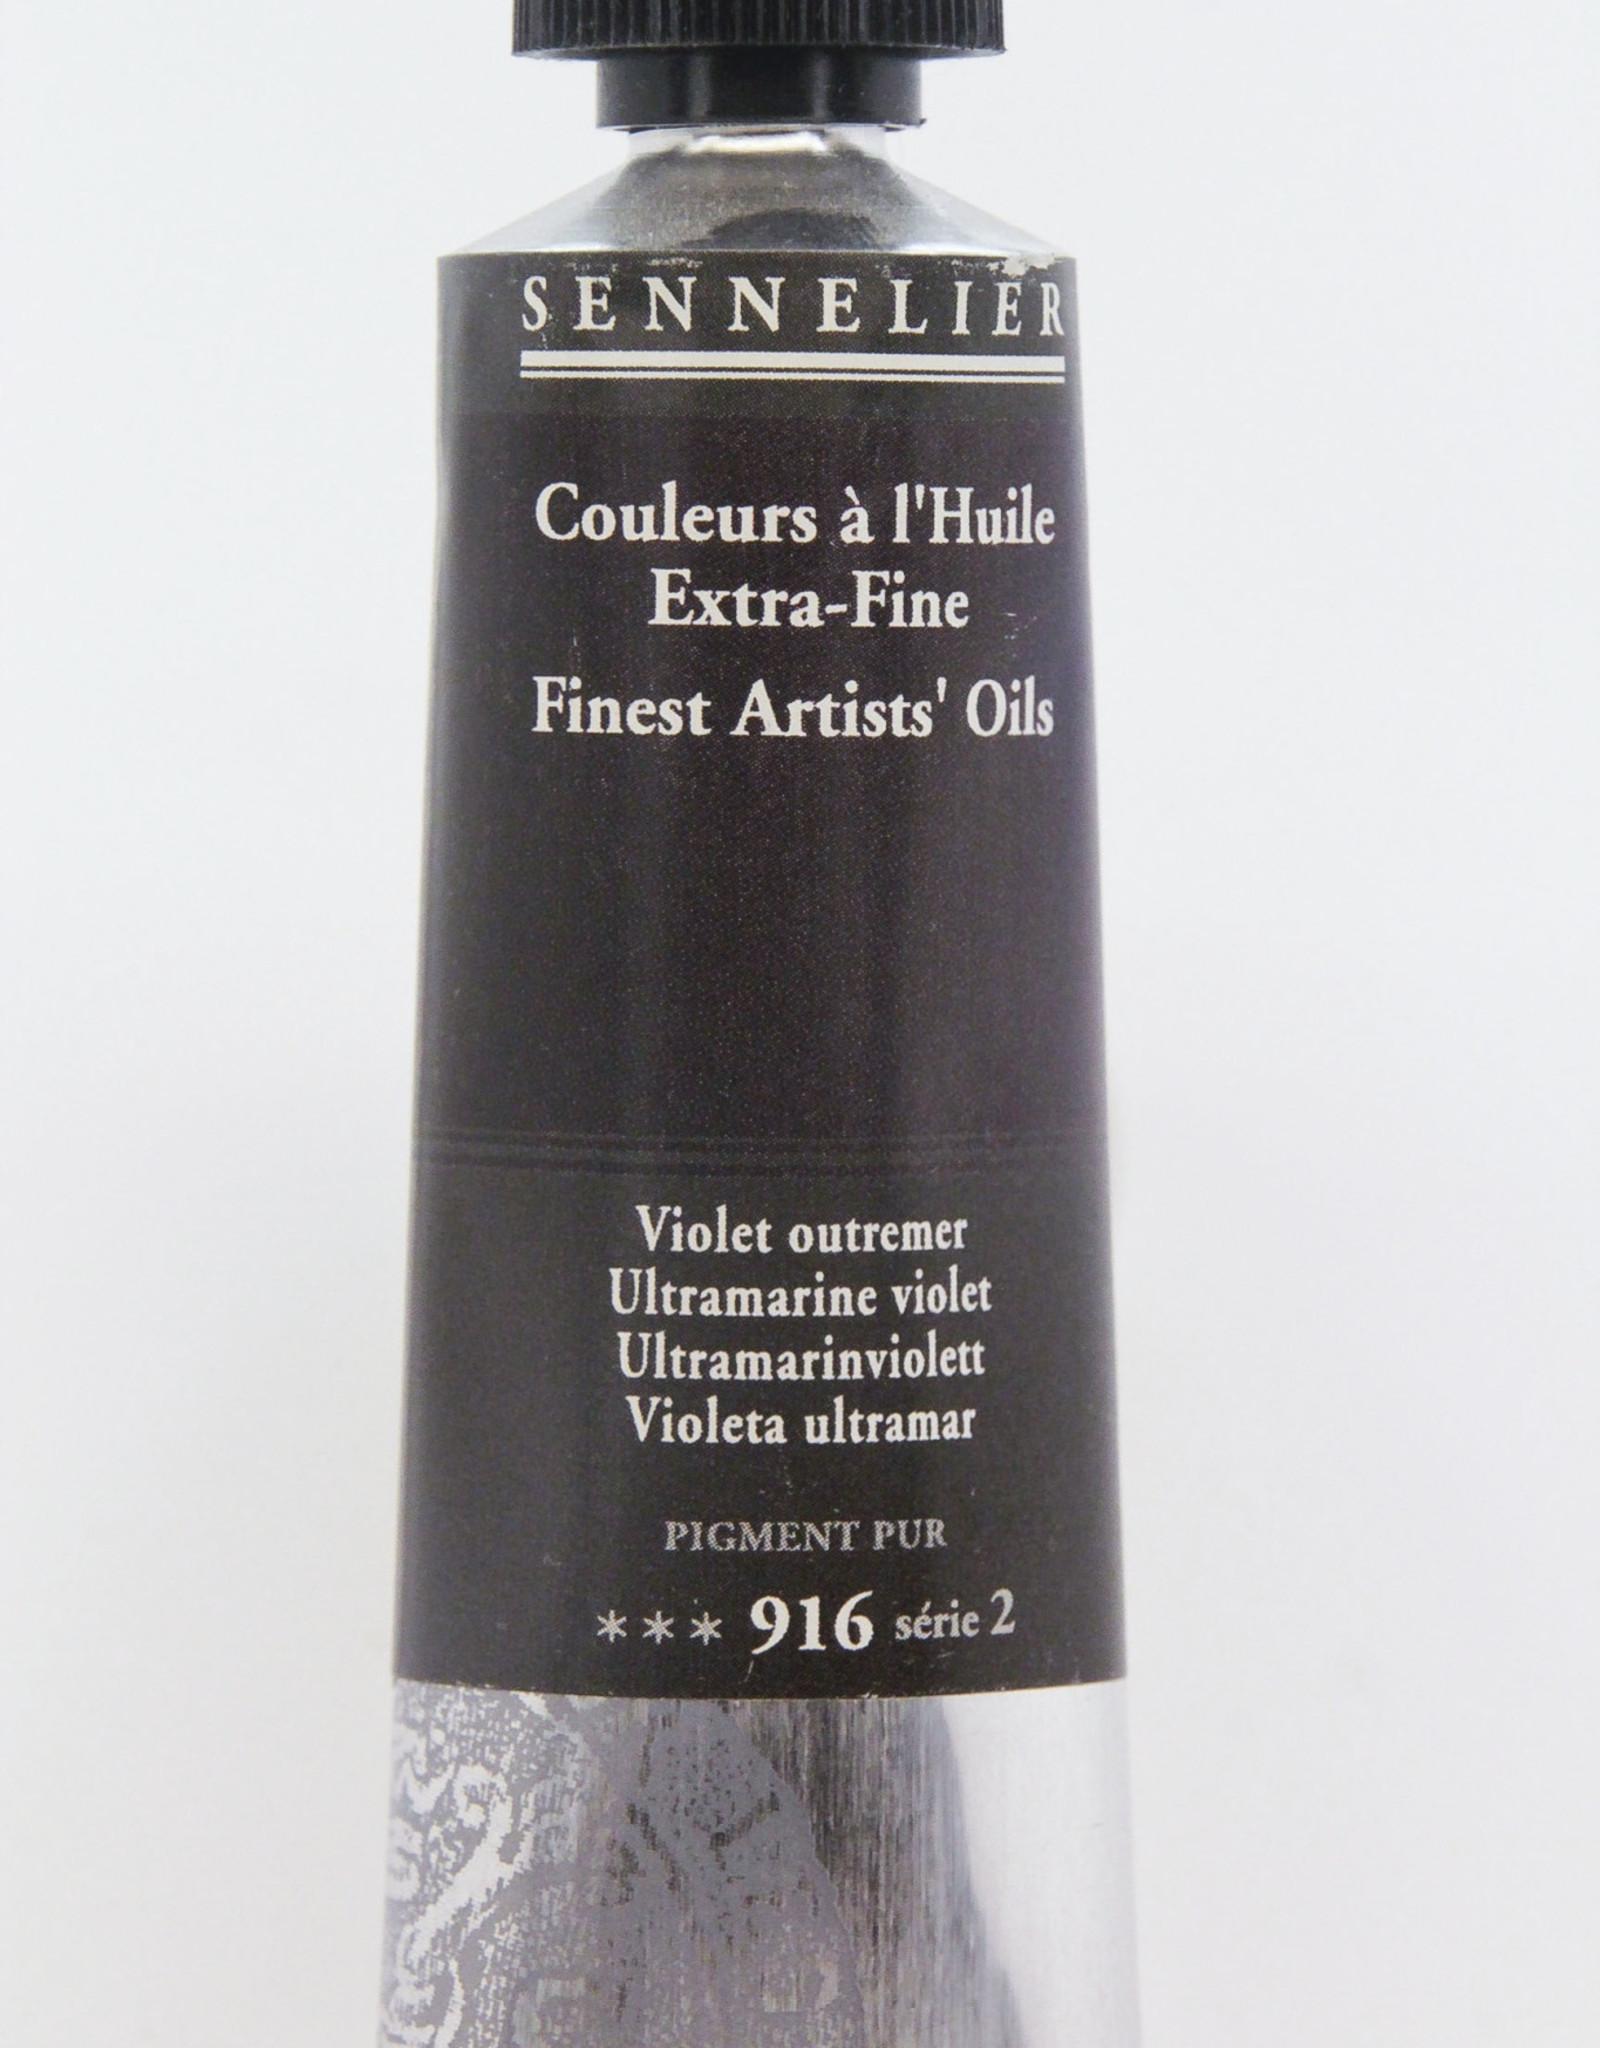 Sennelier, Fine Artists' Oil Paint, Ultramarine Violet, 916, 40ml Tube, Series 2